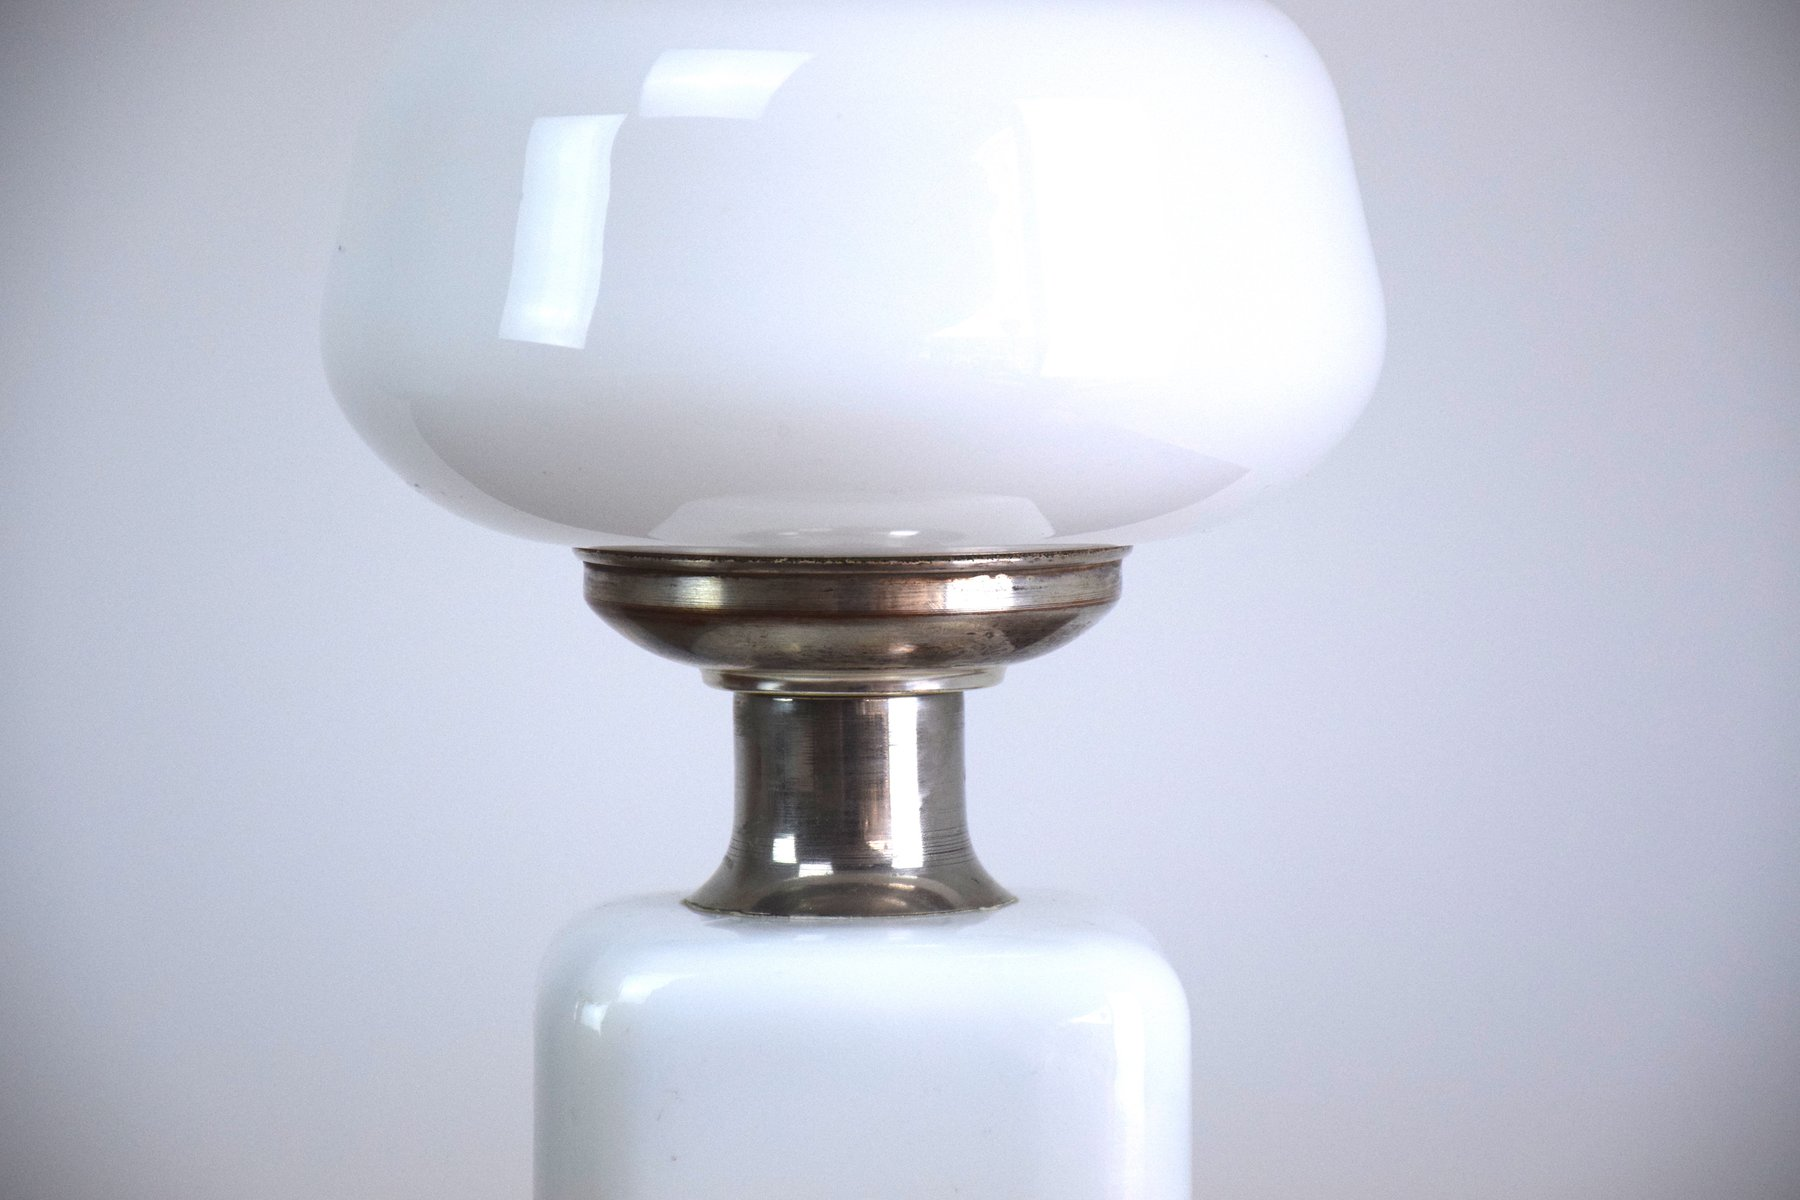 lampe de bureau mushroom mid century en verre blanc 1970s. Black Bedroom Furniture Sets. Home Design Ideas